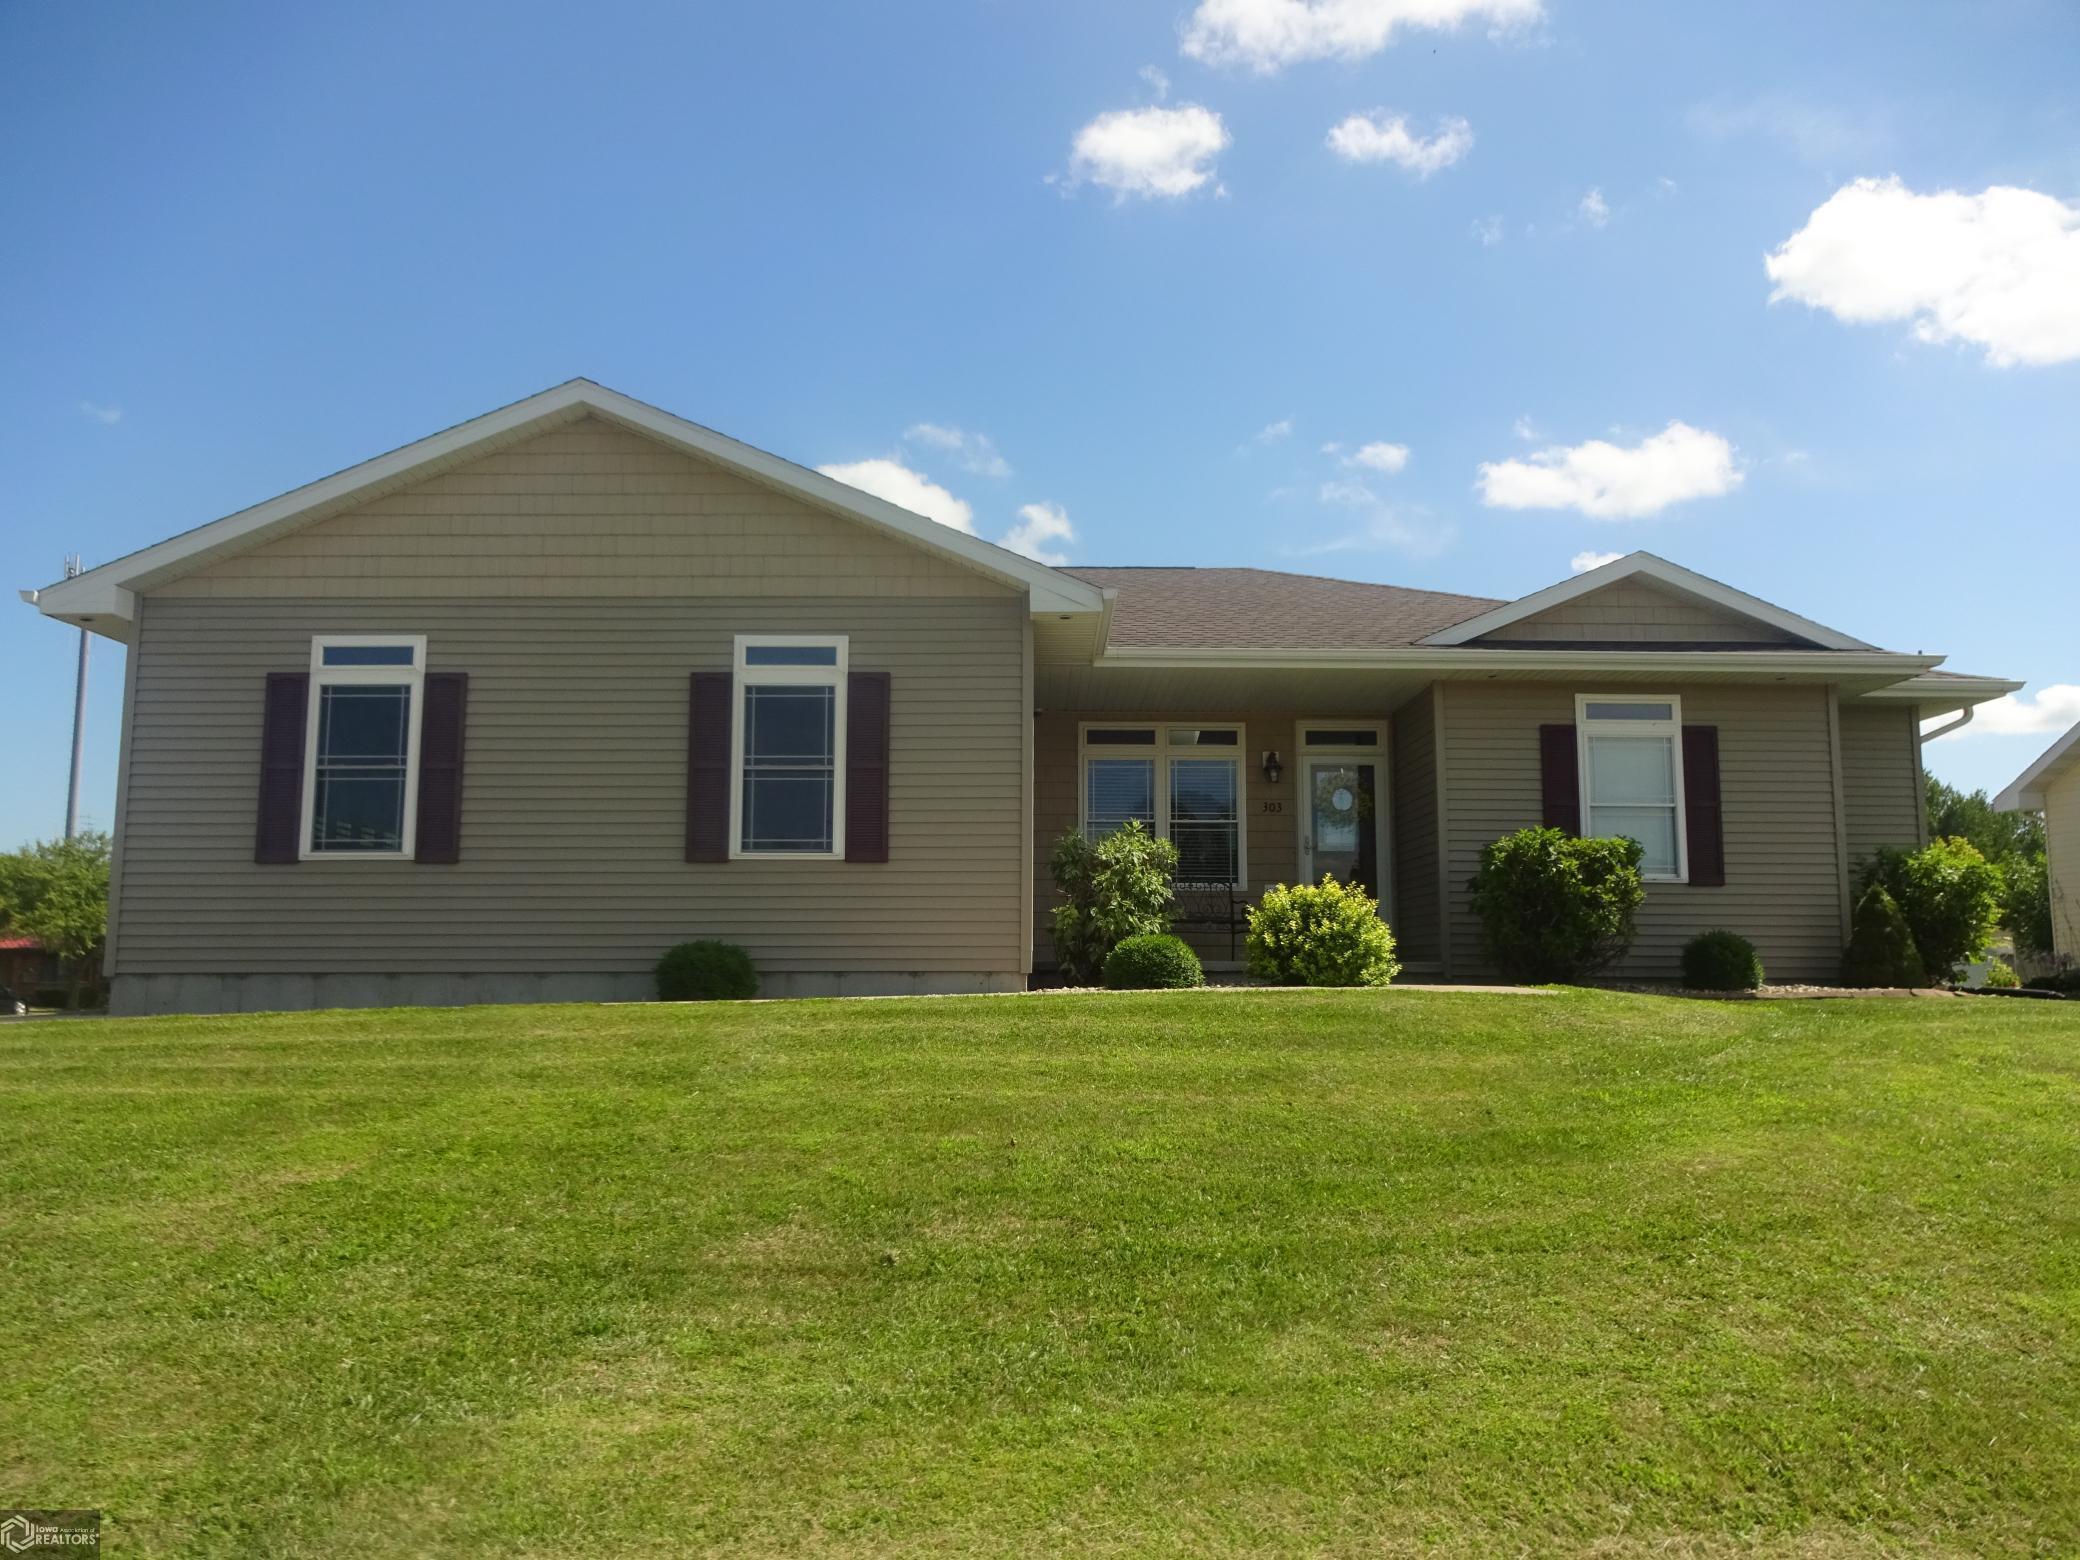 303 Walnut Property Photo - Danville, IA real estate listing